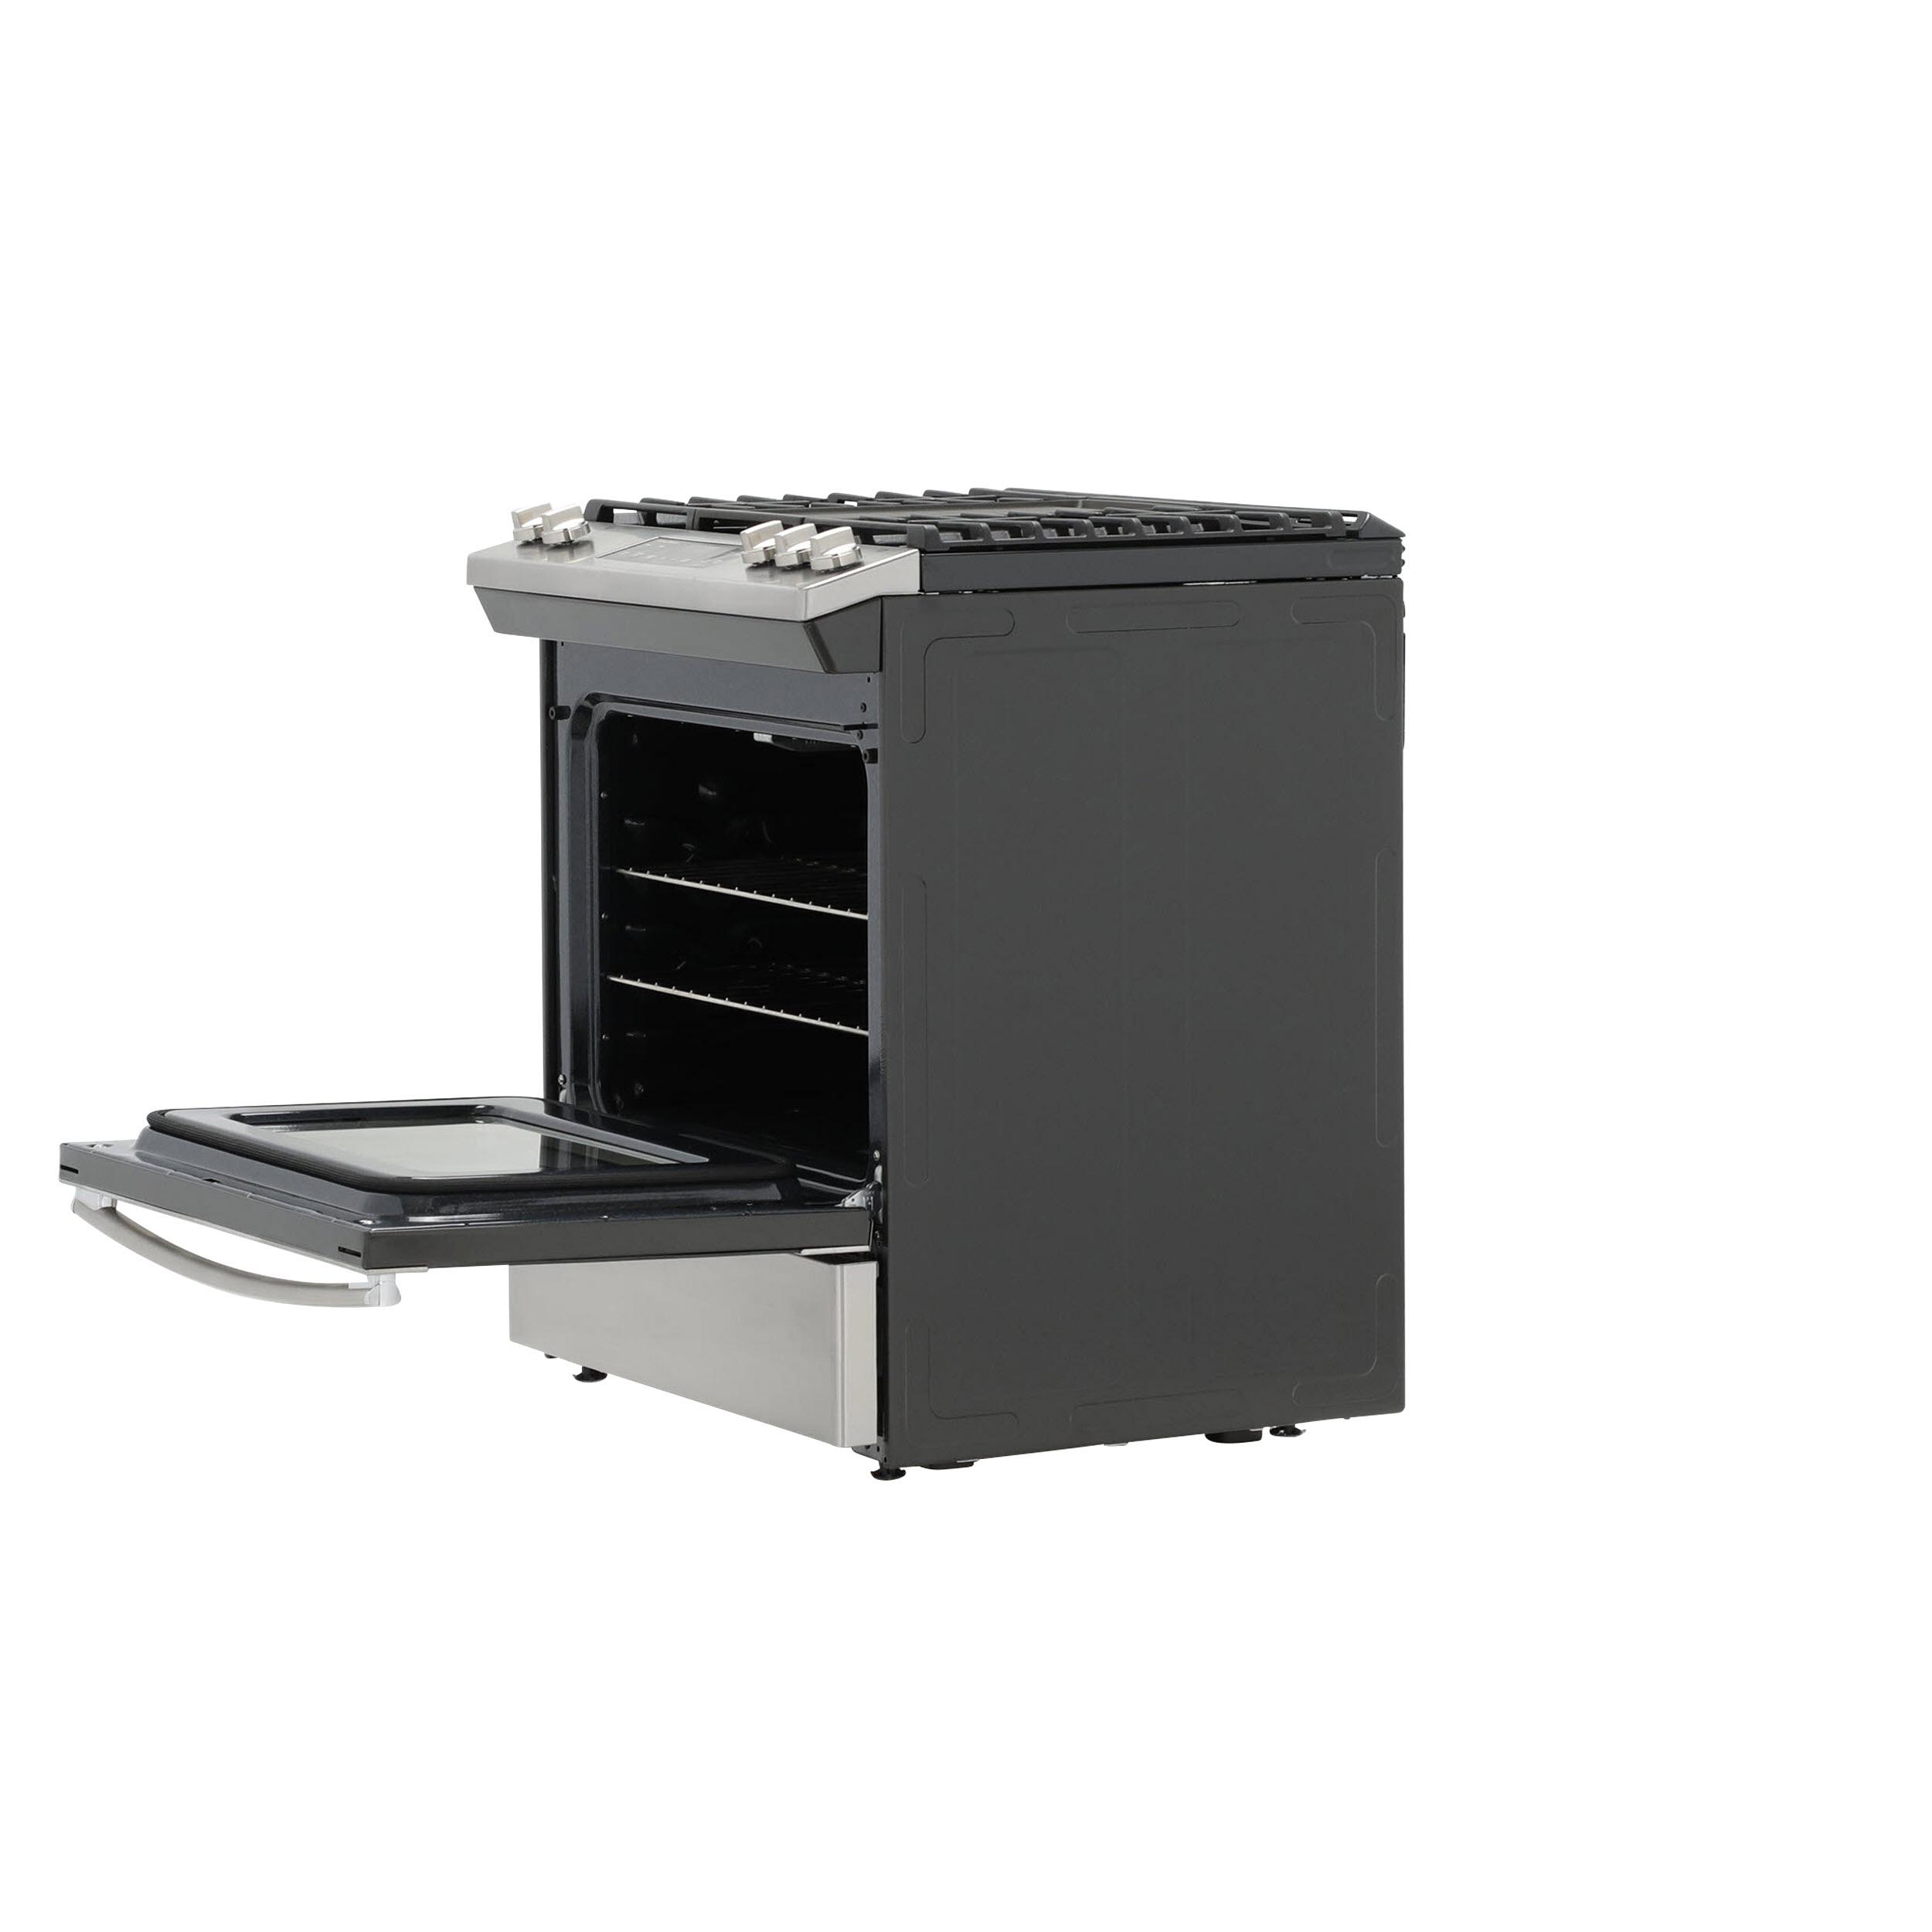 "Model: JGSS66SELSS | GE GE® 30"" Slide-In Front Control Gas Range"